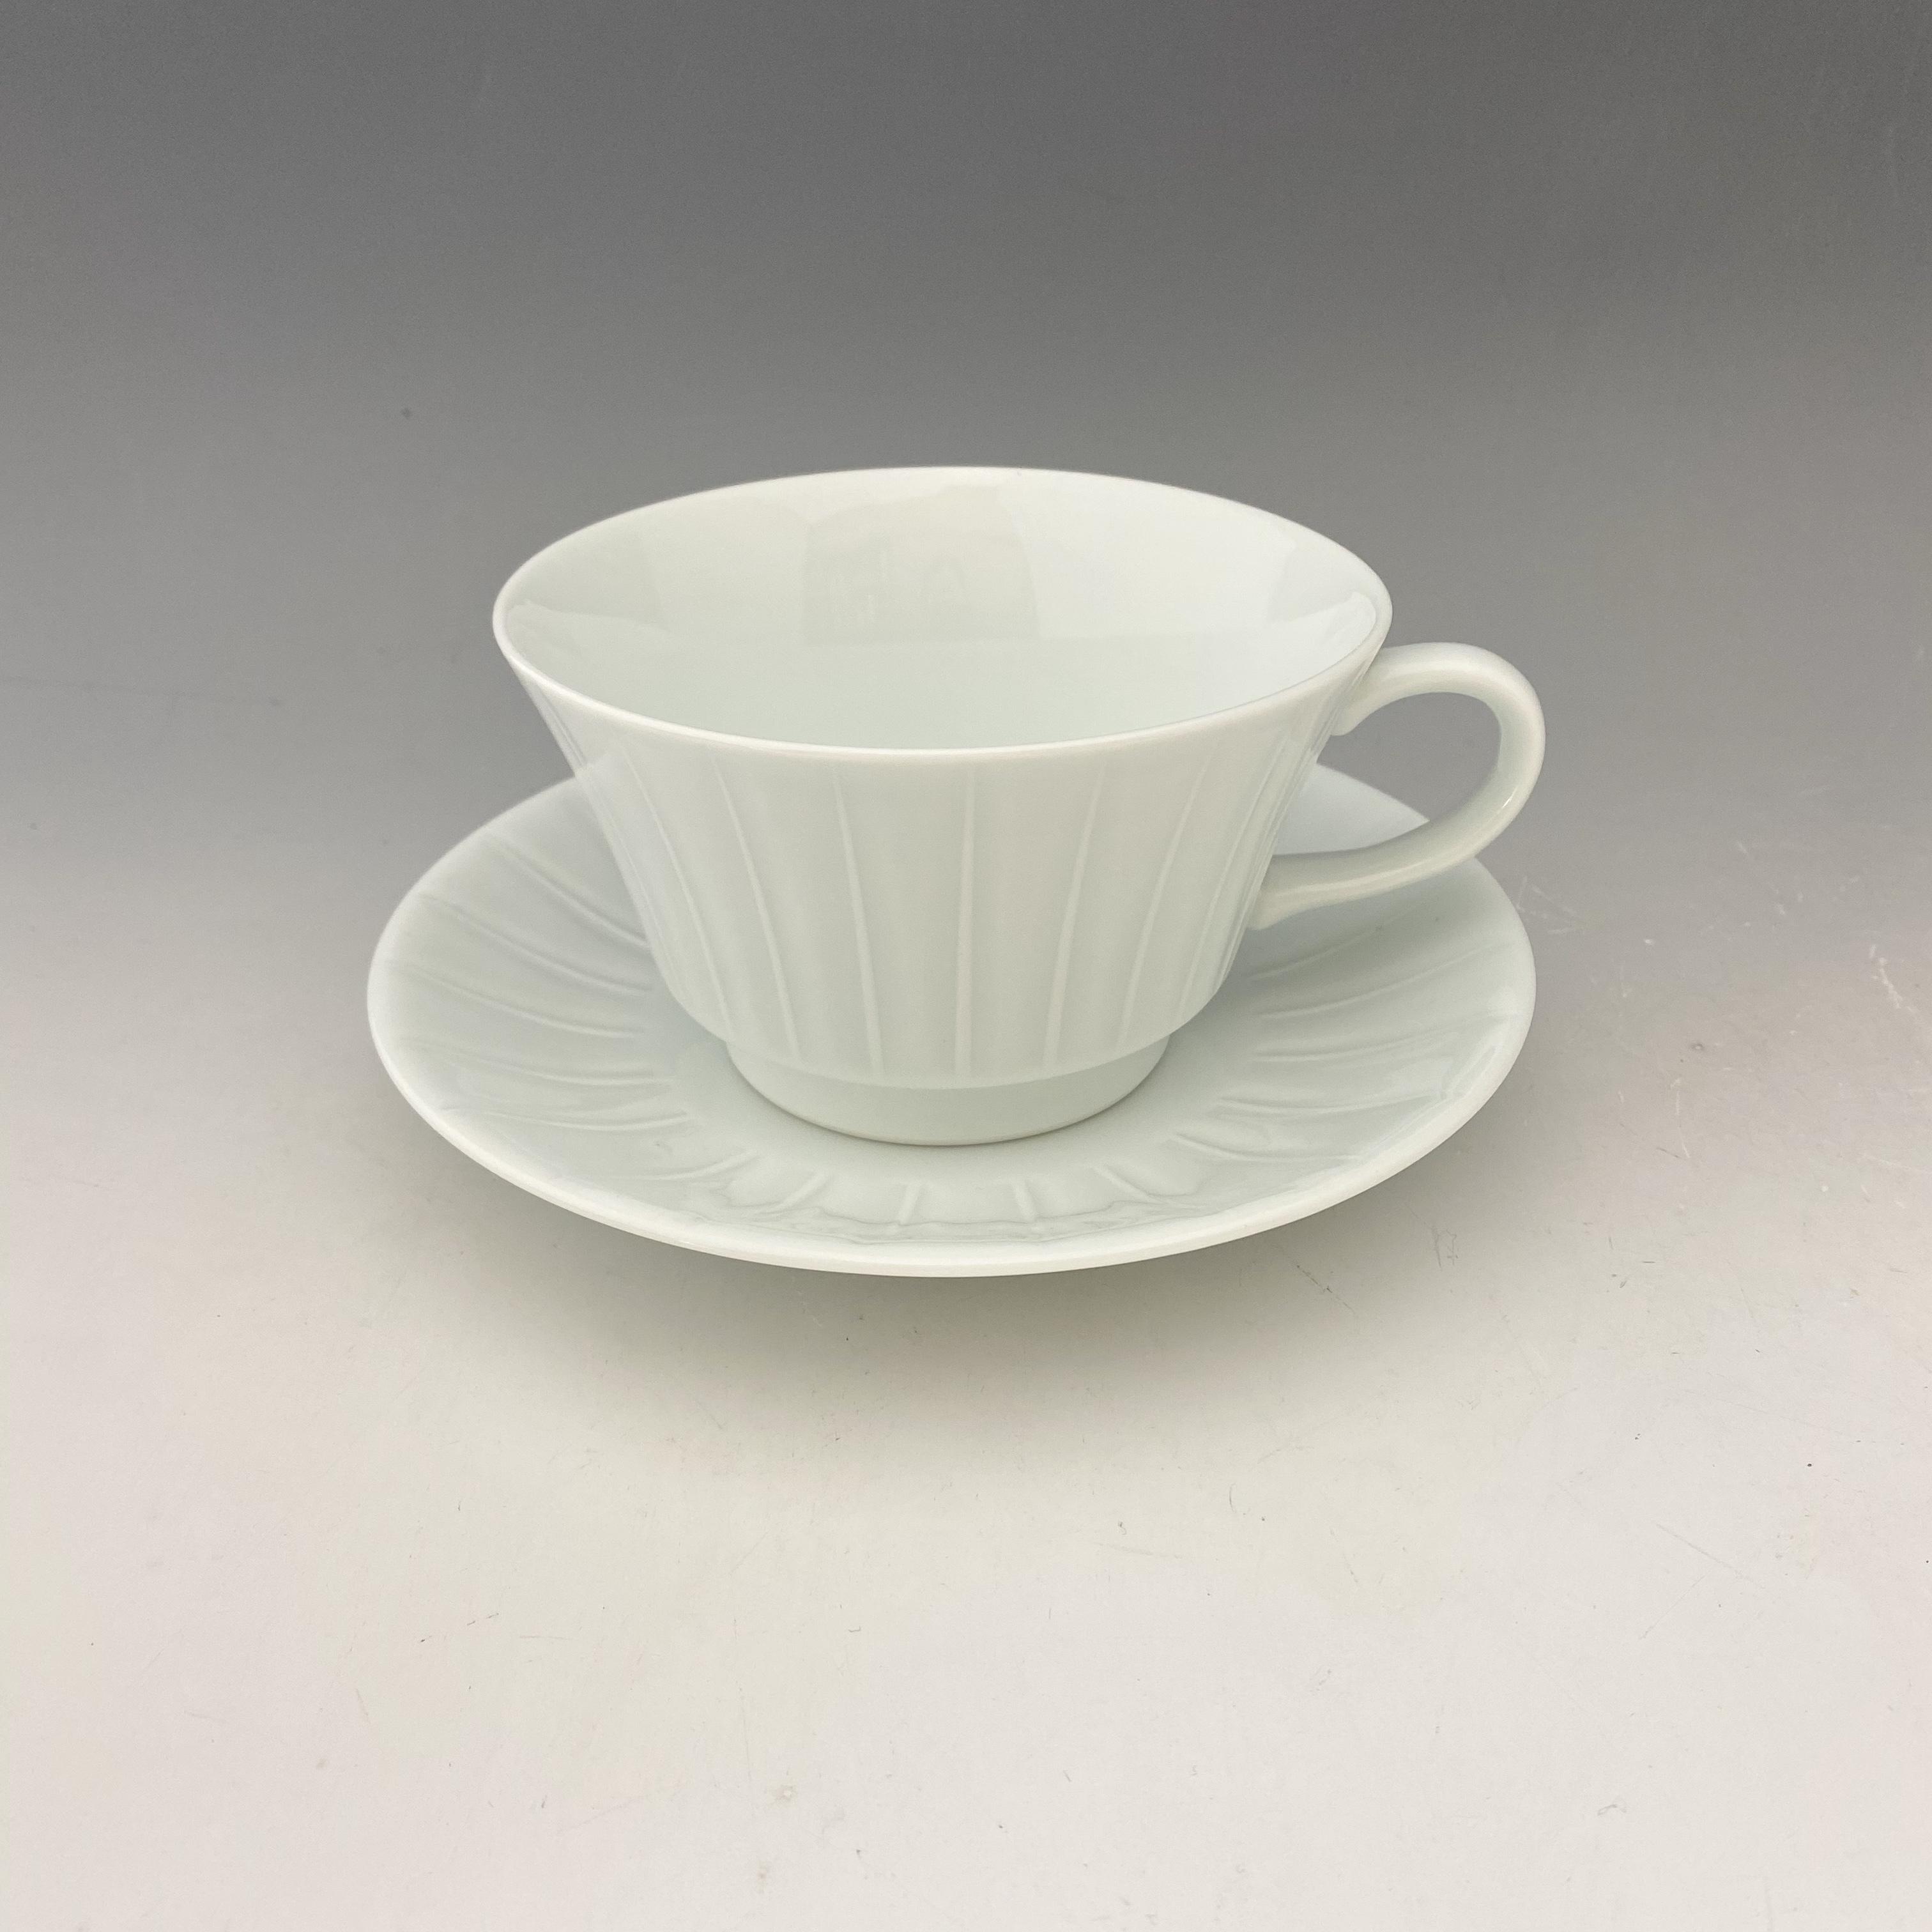 【中尾恭純】白磁線彫スープ碗皿